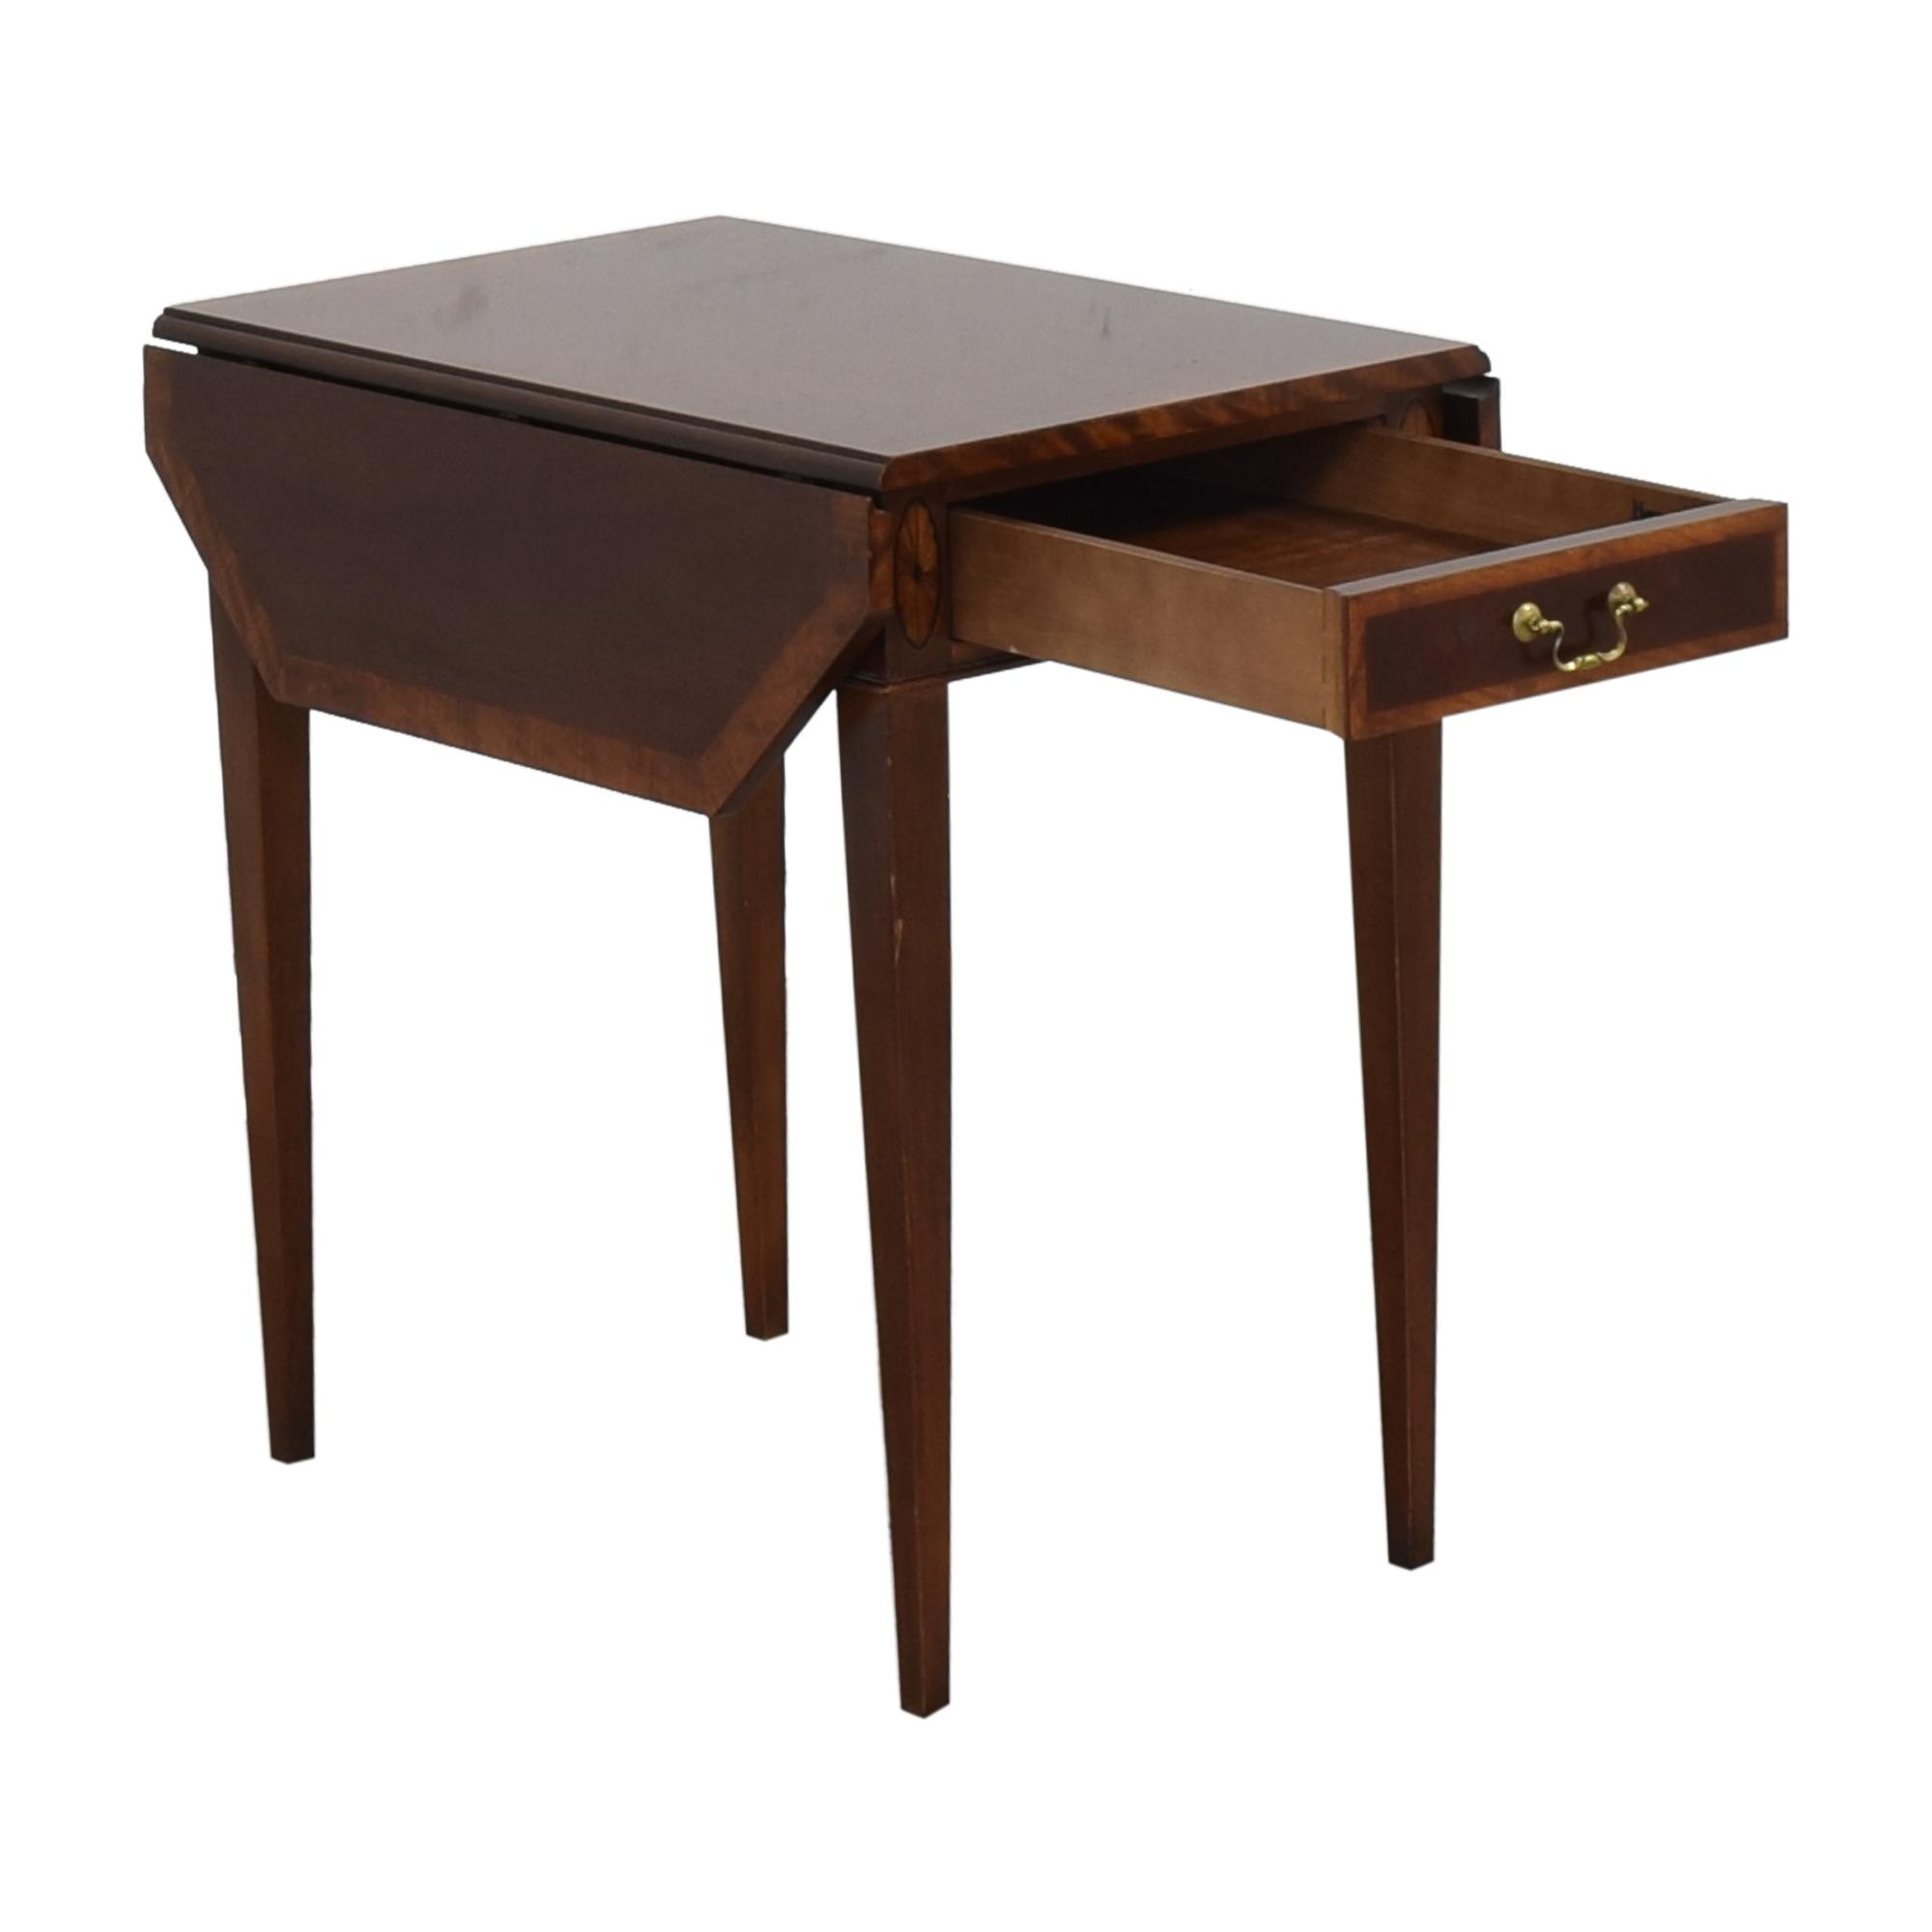 shop Henredon Drop Leaf Accent Table Henredon Furniture Accent Tables